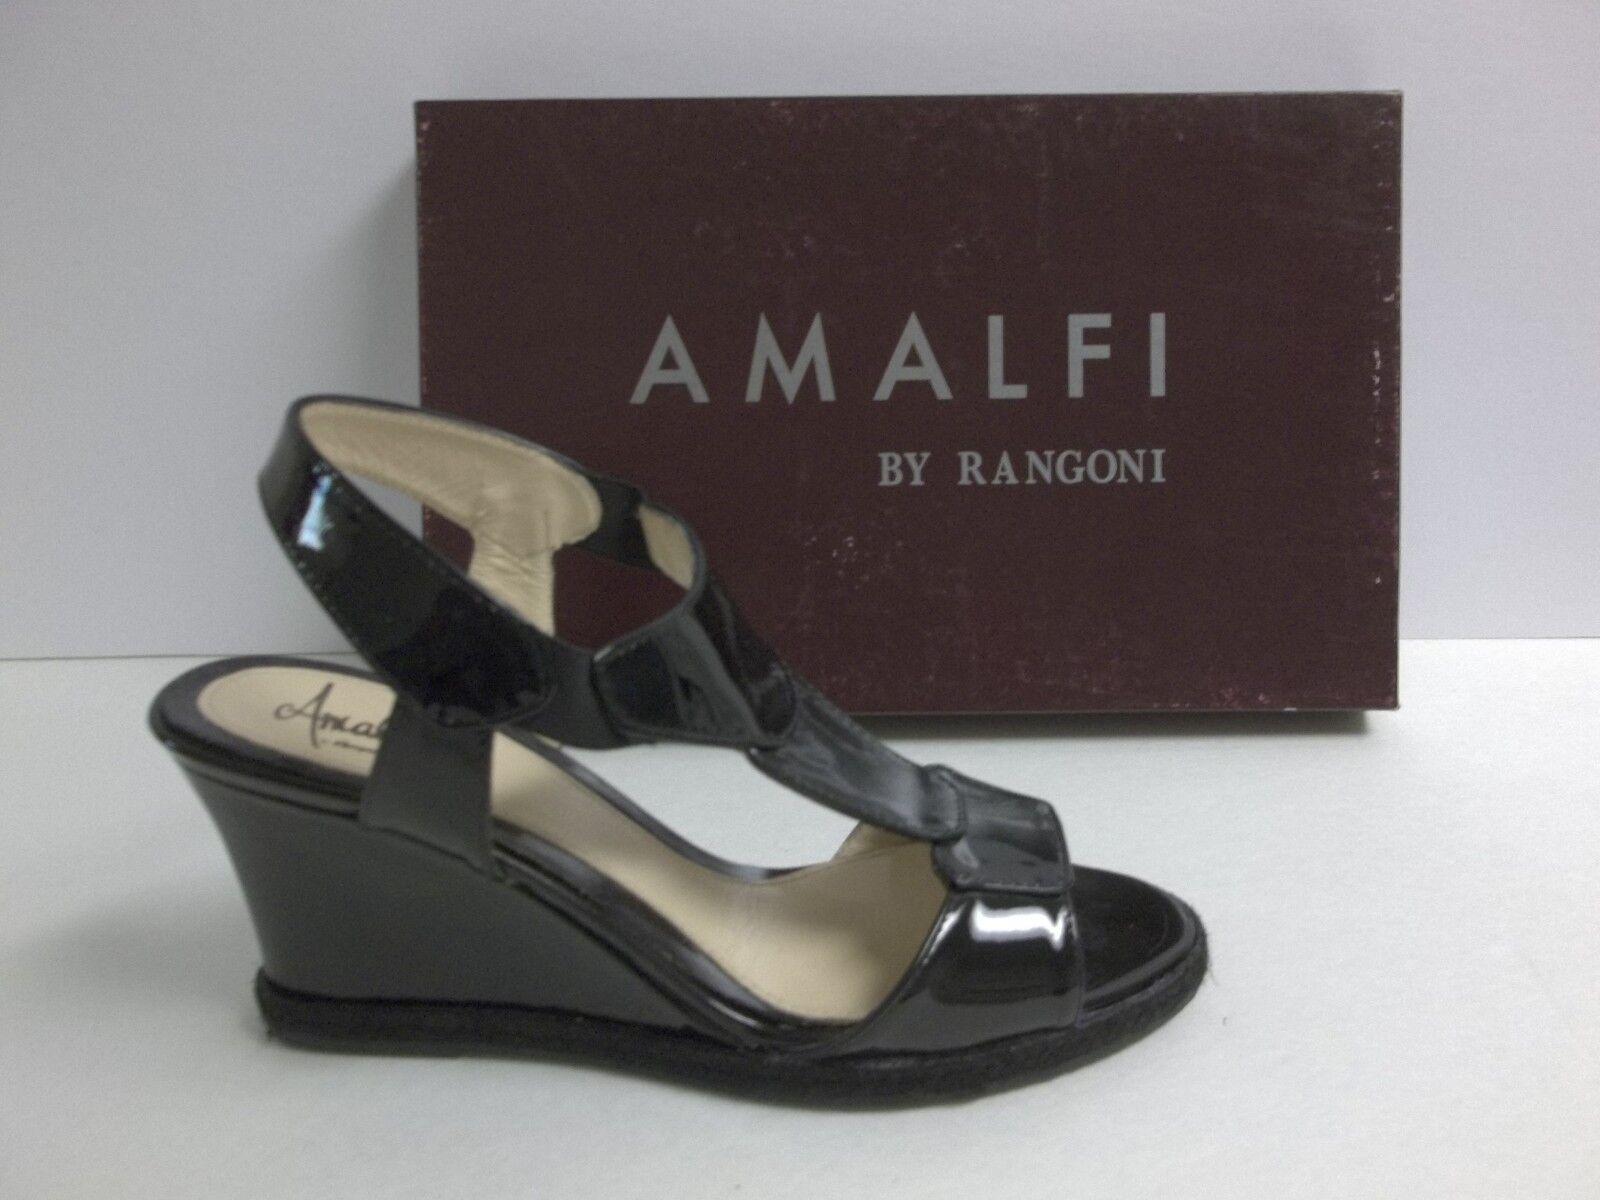 venta al por mayor barato Amalfi Amalfi Amalfi By Rangoni tamaño 7.5 M Lodi Negro Cuero Nuevos Mujer Zapatos Sandalias de cuña  tienda en linea